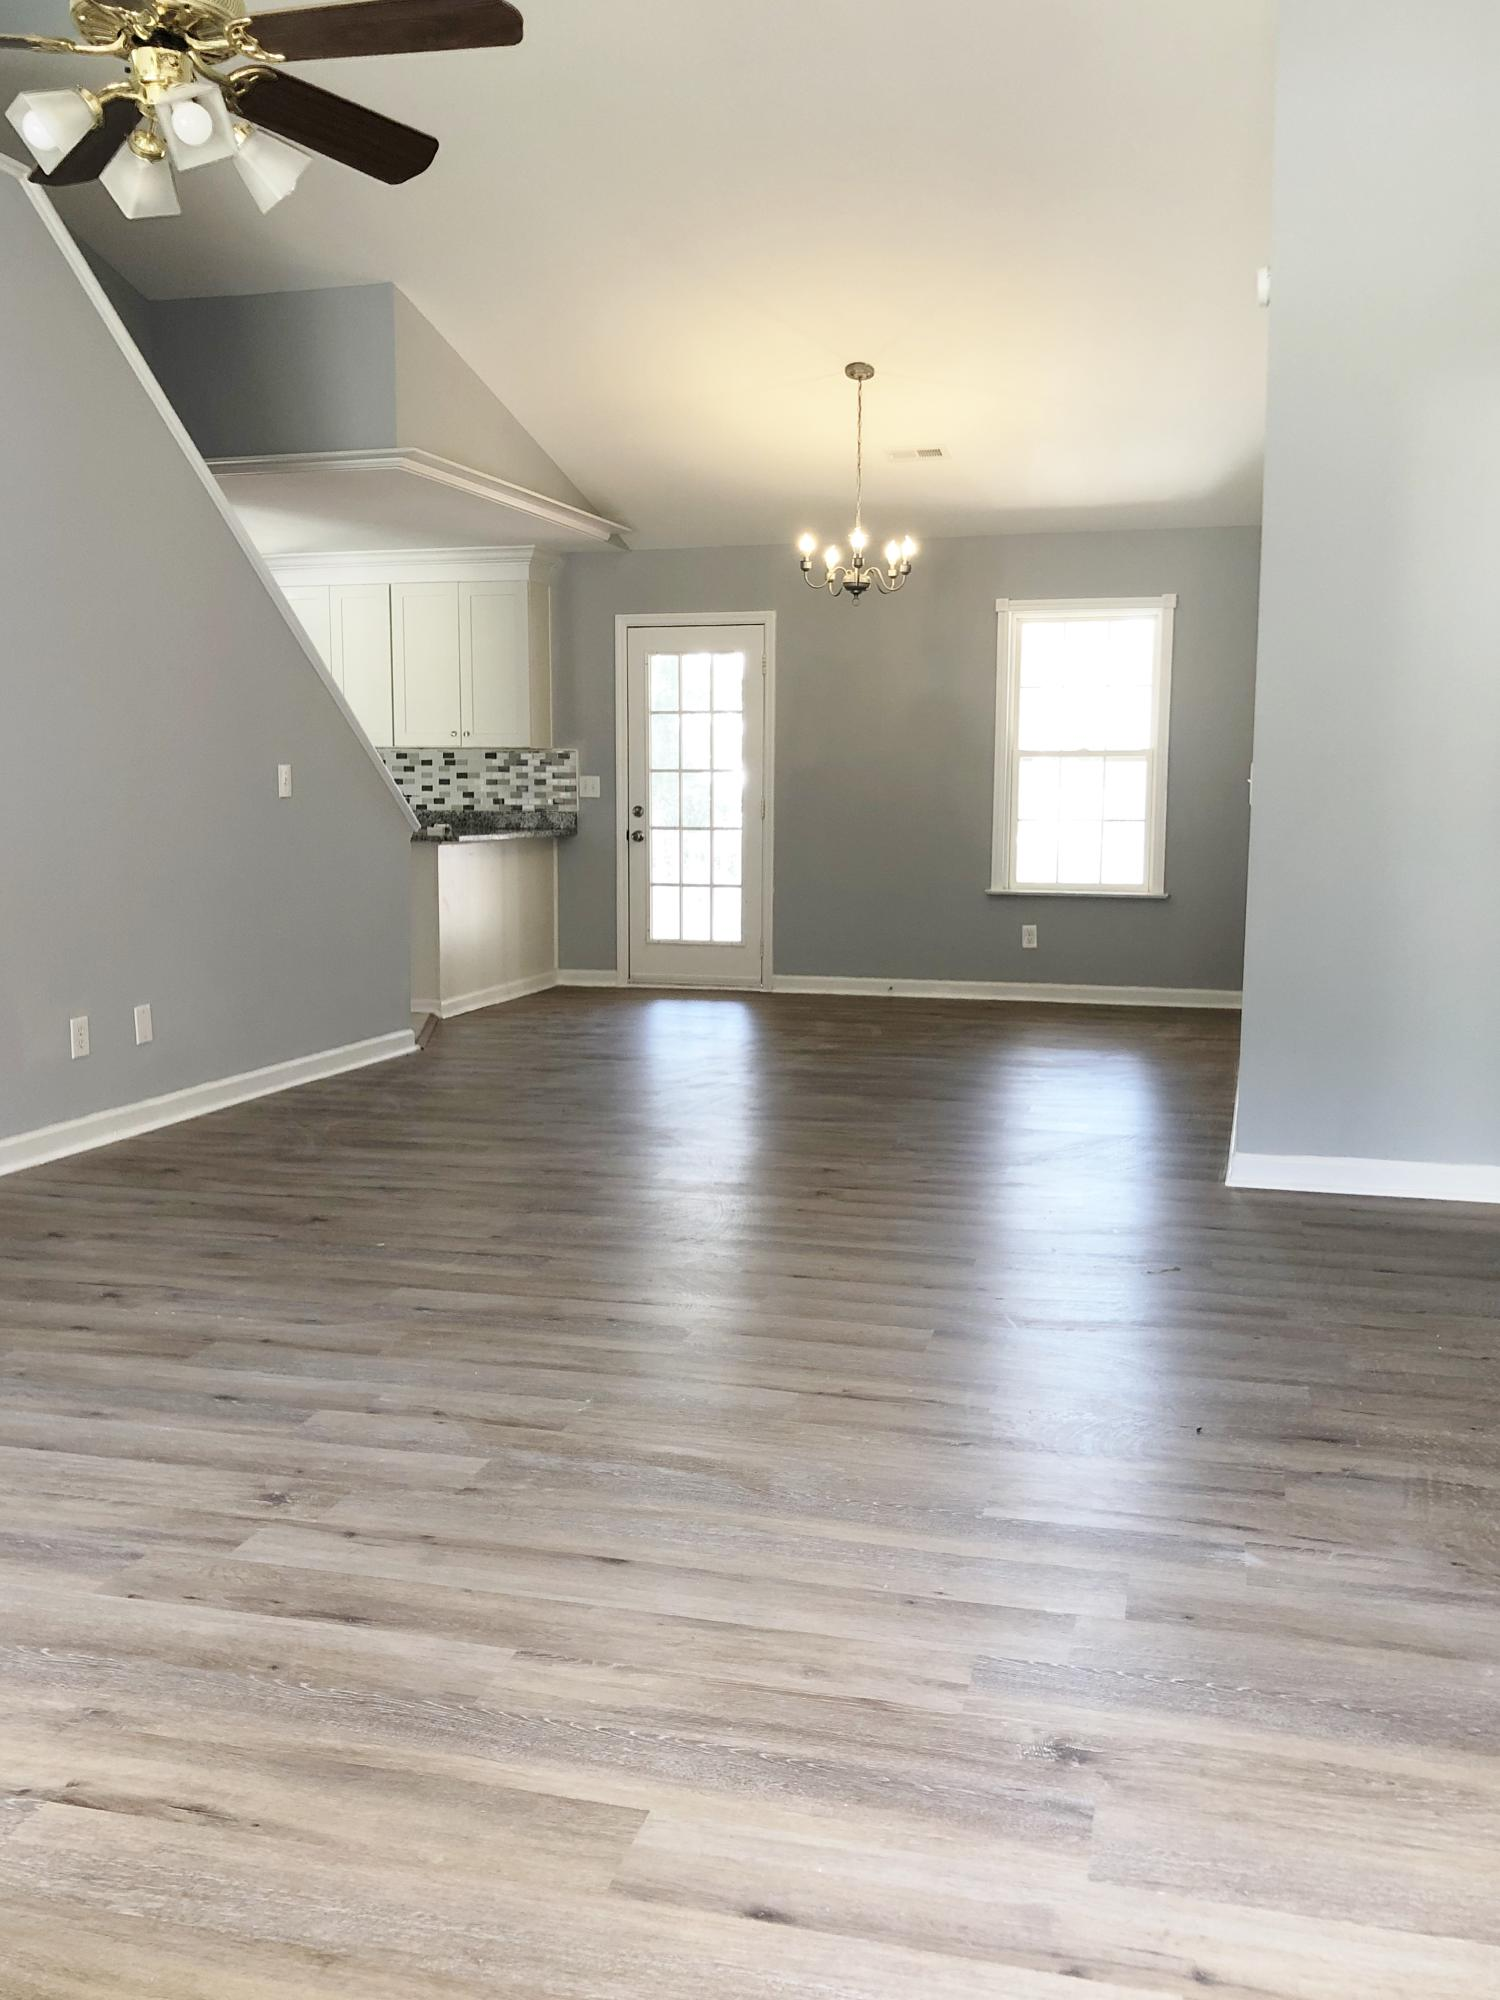 Plantation Point Homes For Sale - 6656 Bent Creek, North Charleston, SC - 19